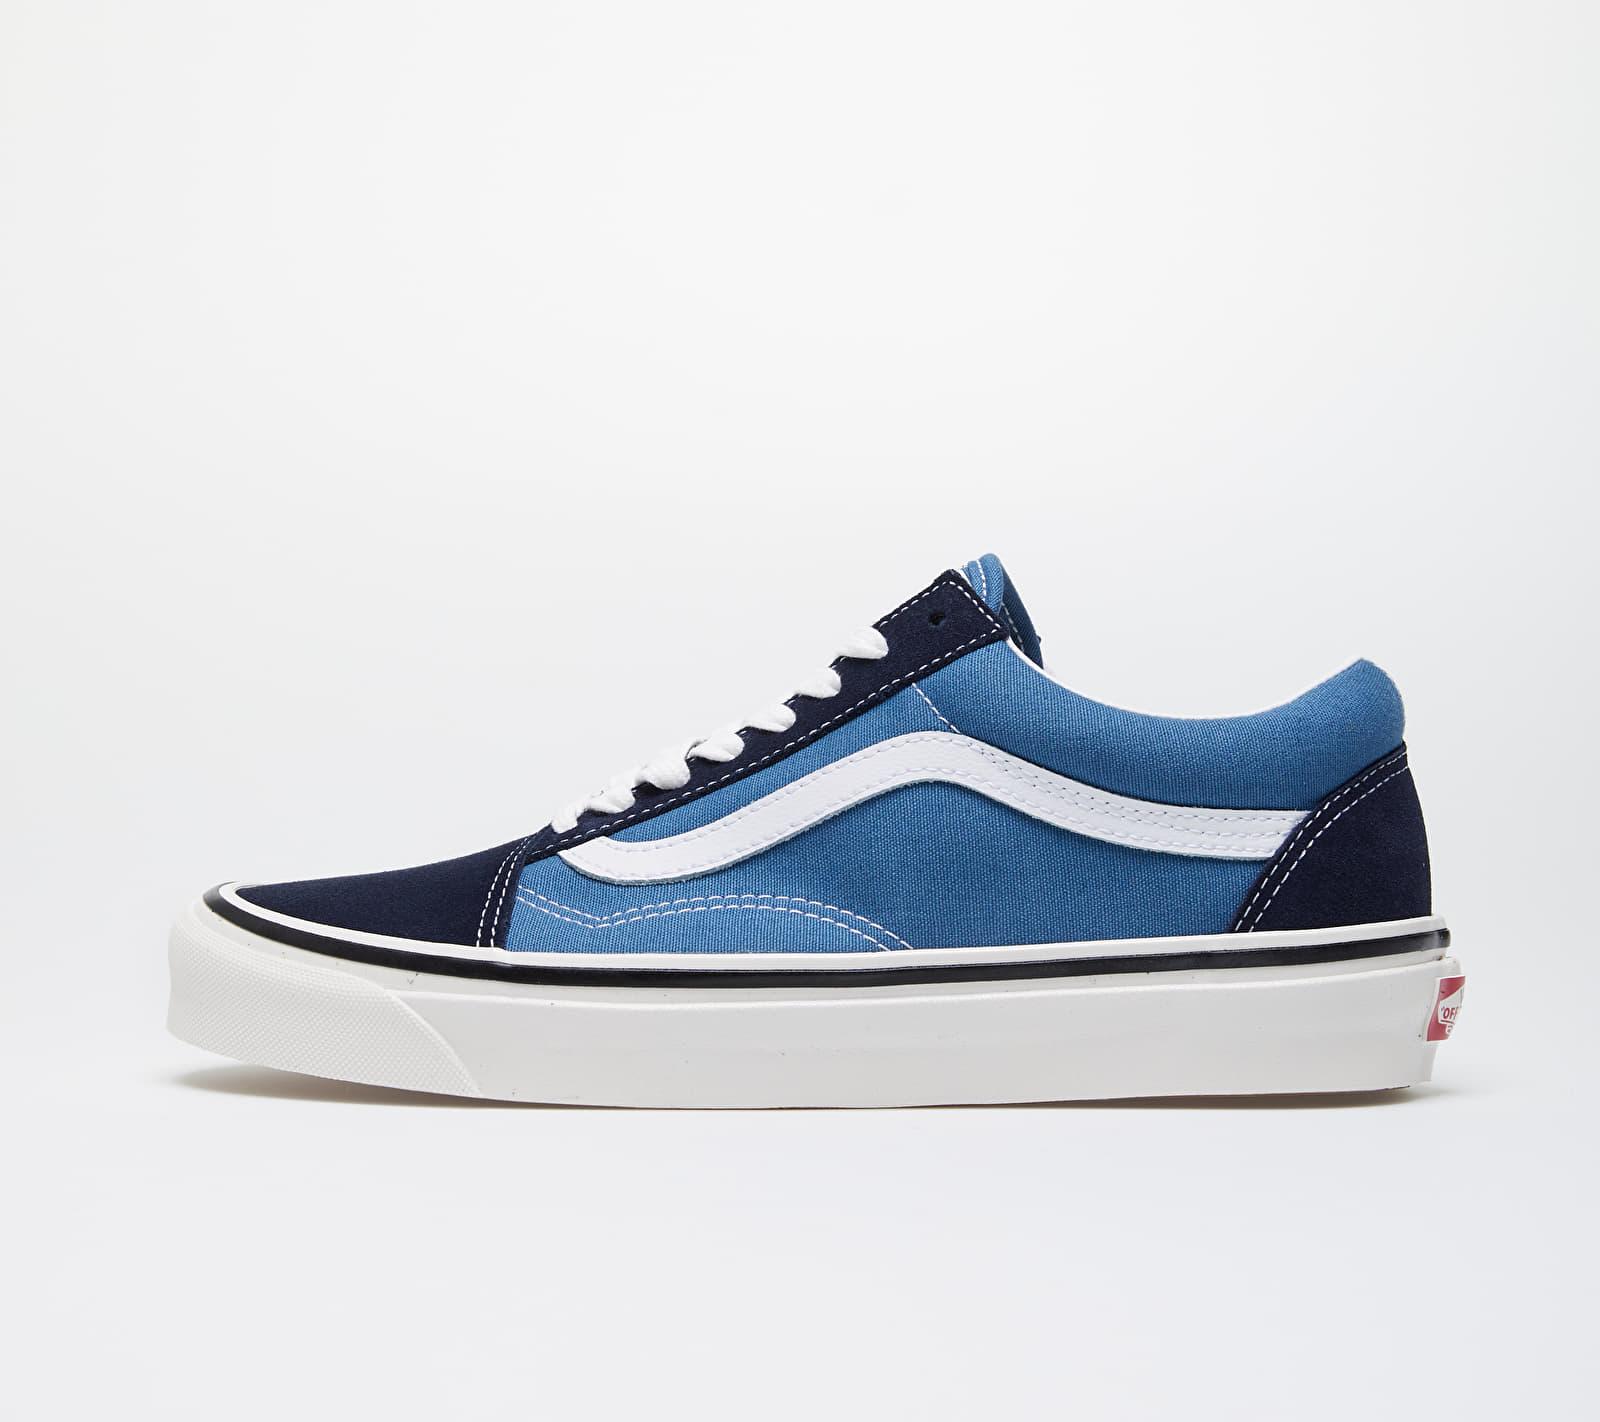 Vans Old Skool 36 Dx (Anaheim Factory) Dark Blues/ Og VN0A38G2SU01